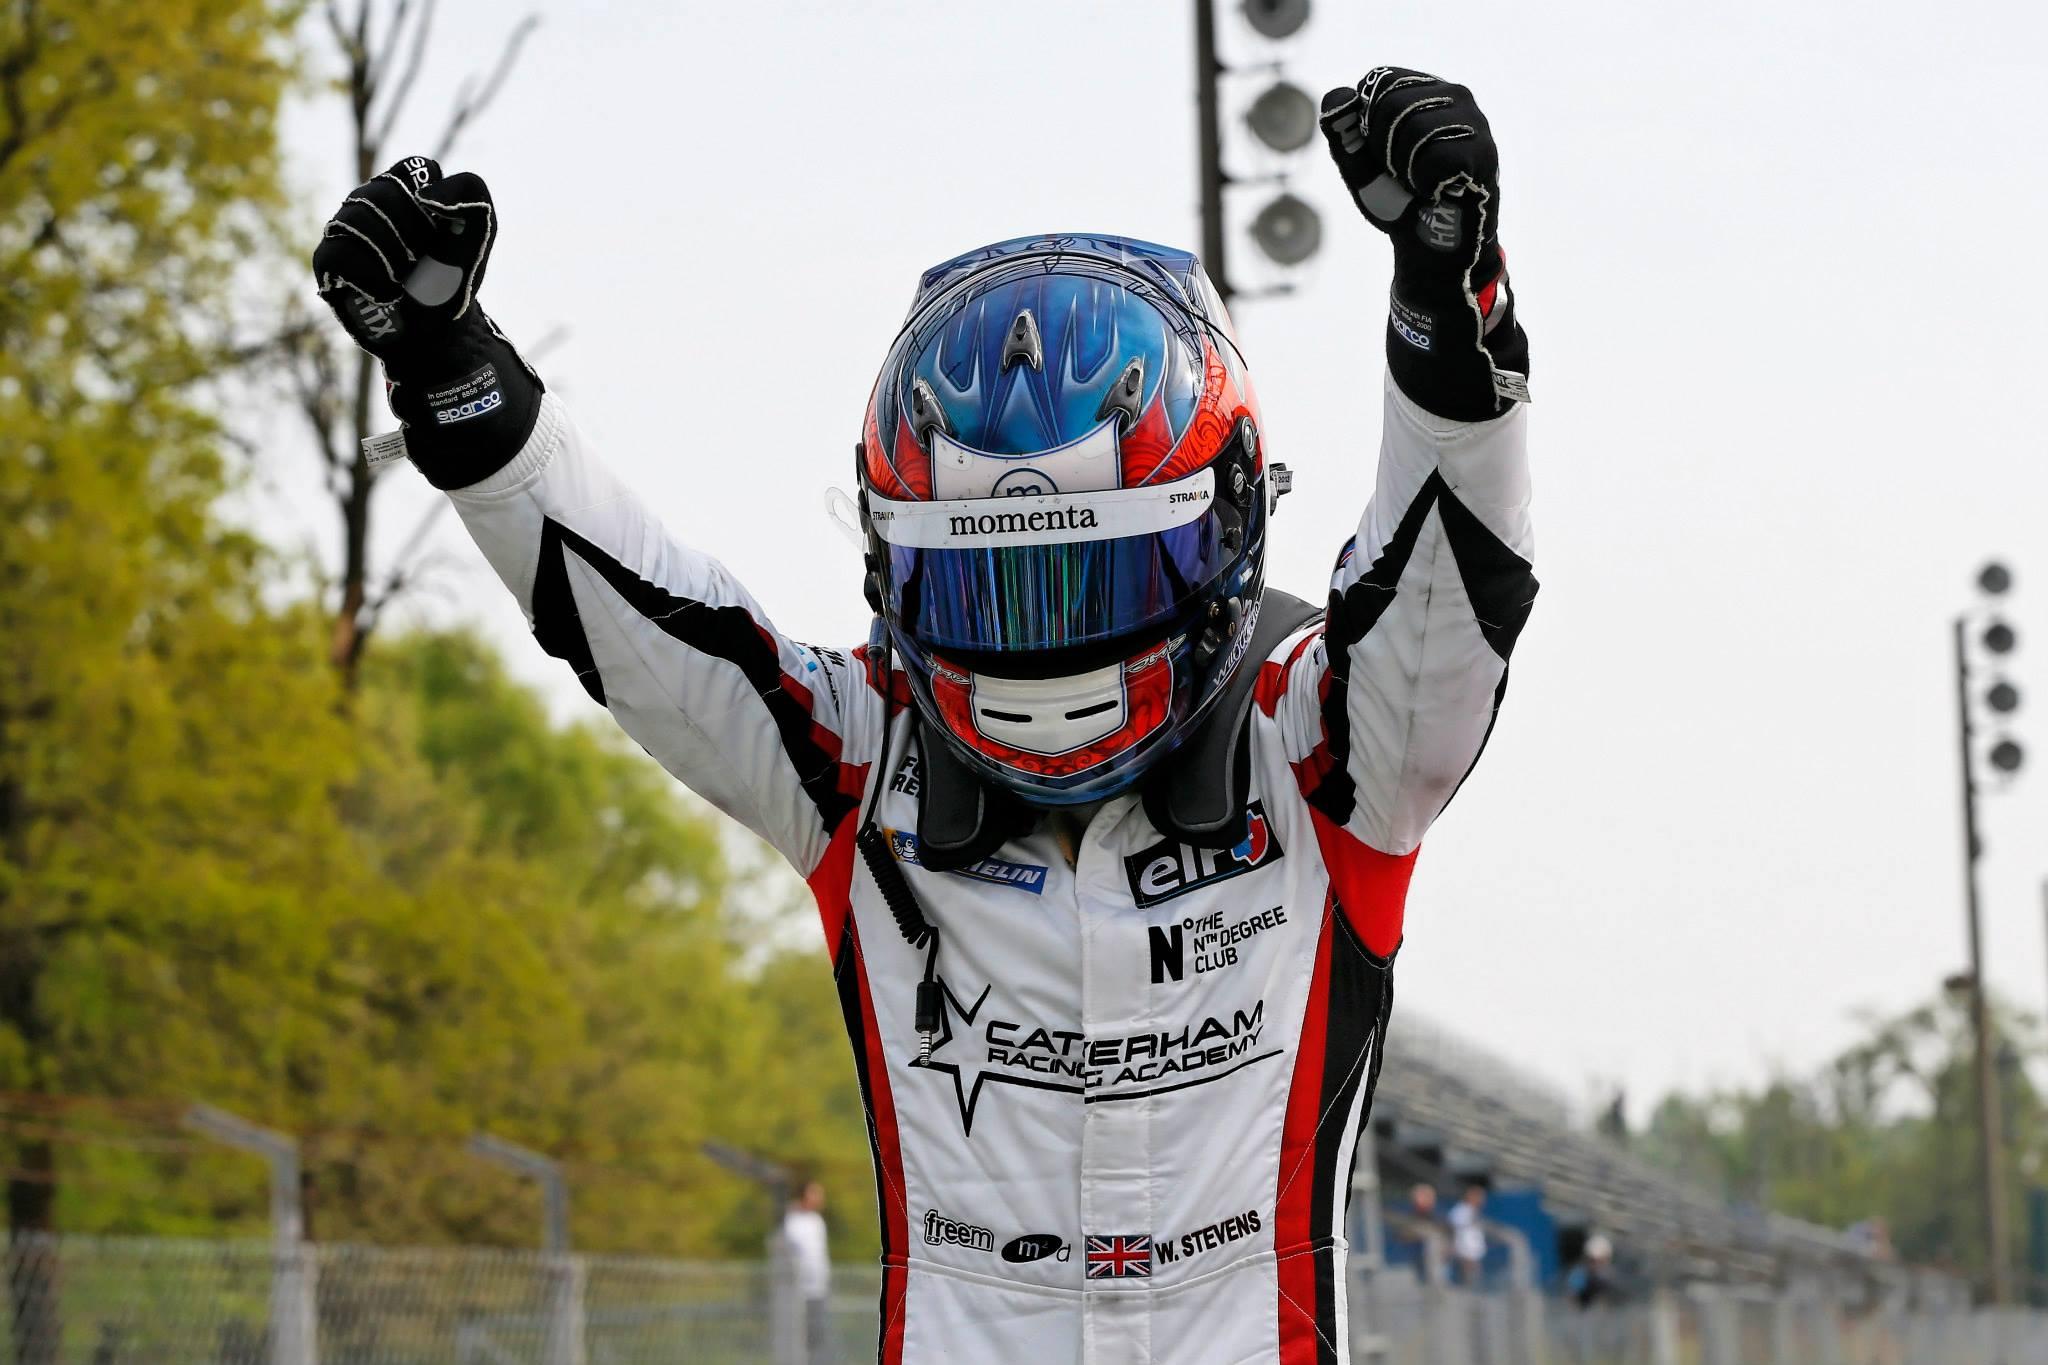 2014 Formula Renault 3.5 Series - Monza - Will Stevens